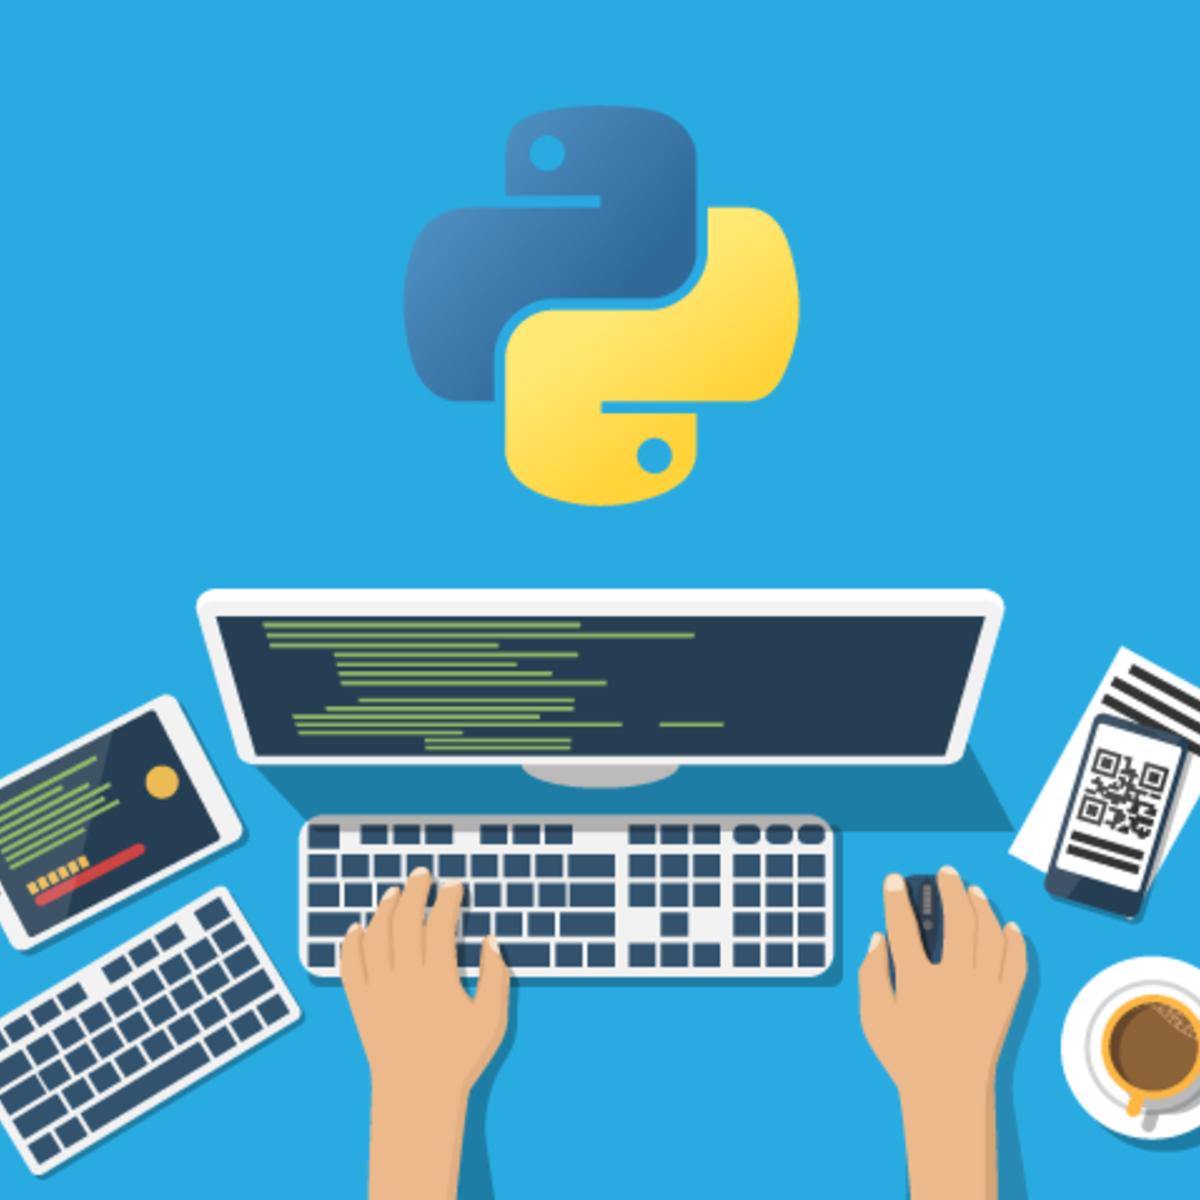 Introducción a la programación en Python I: Aprendiendo a programar con Python course image